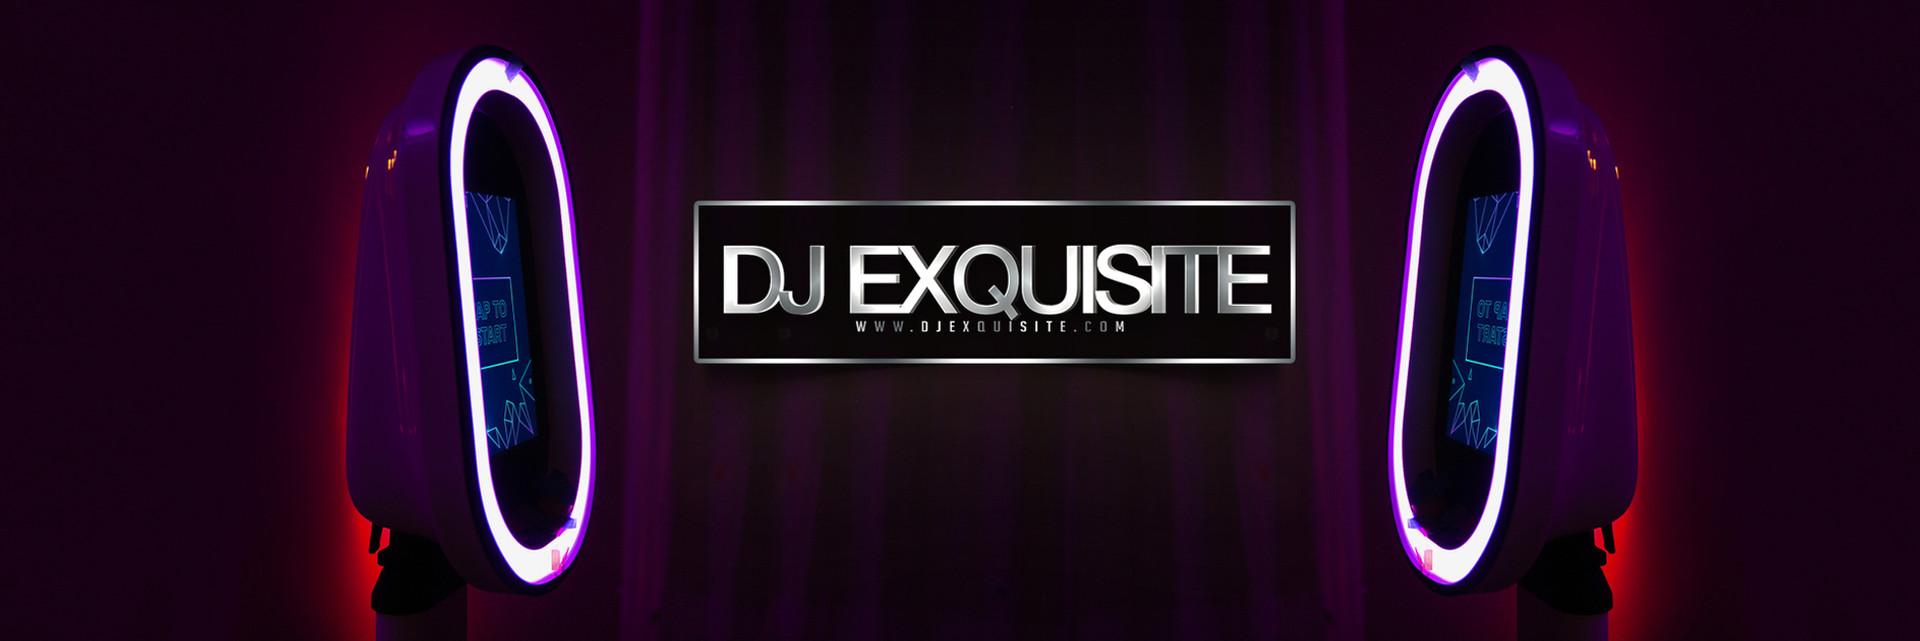 DJ EXQUISITE PHOTO BOOTH .jpg